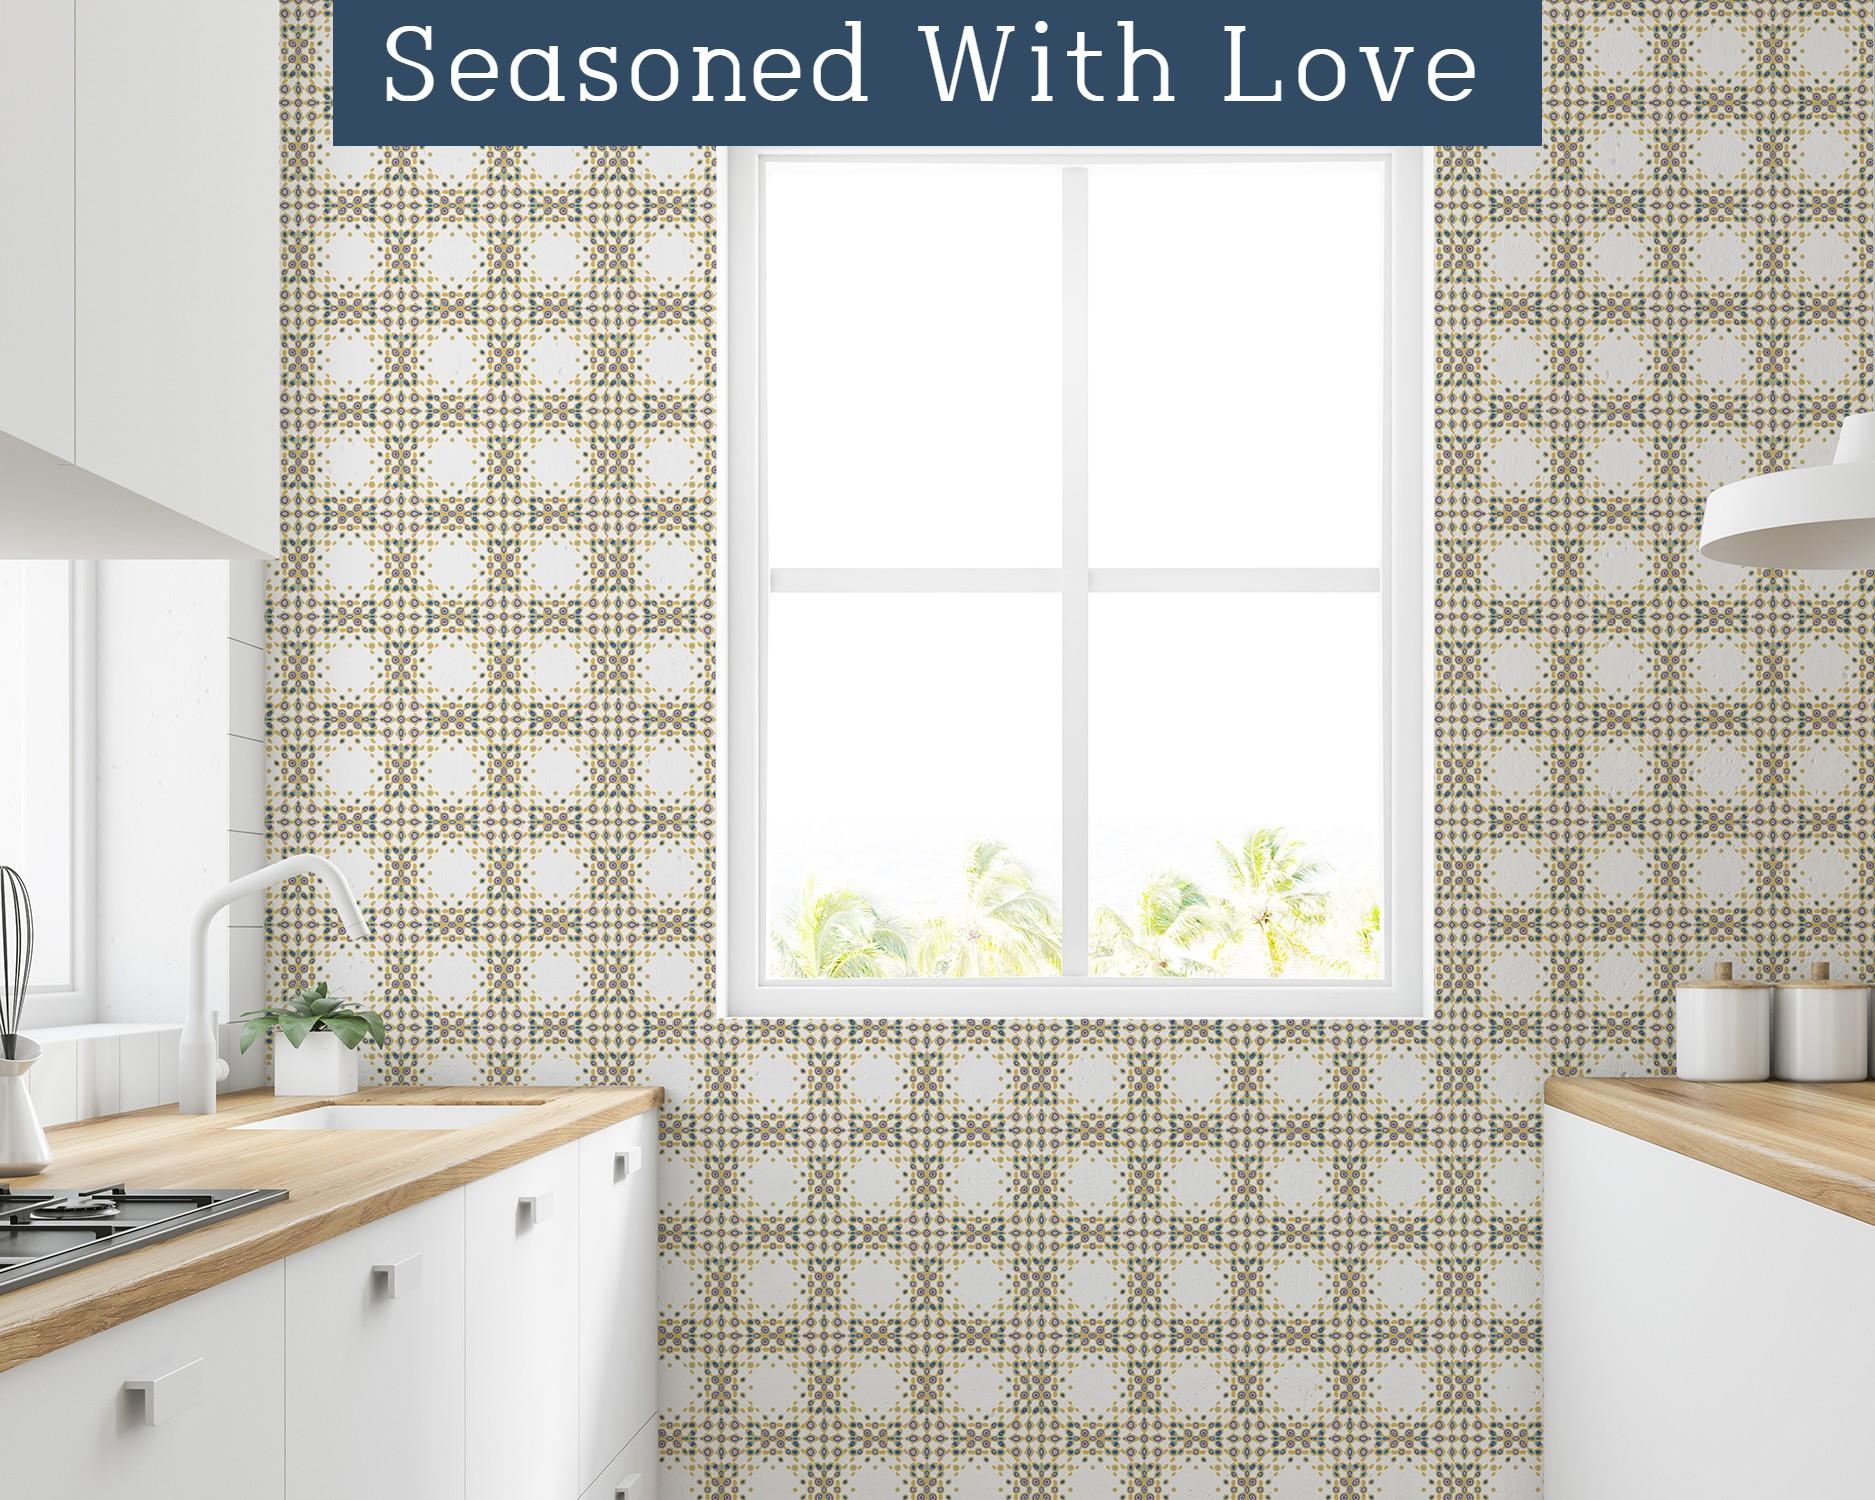 modern-mosaic-kitchen-1-150-ppi.jpg